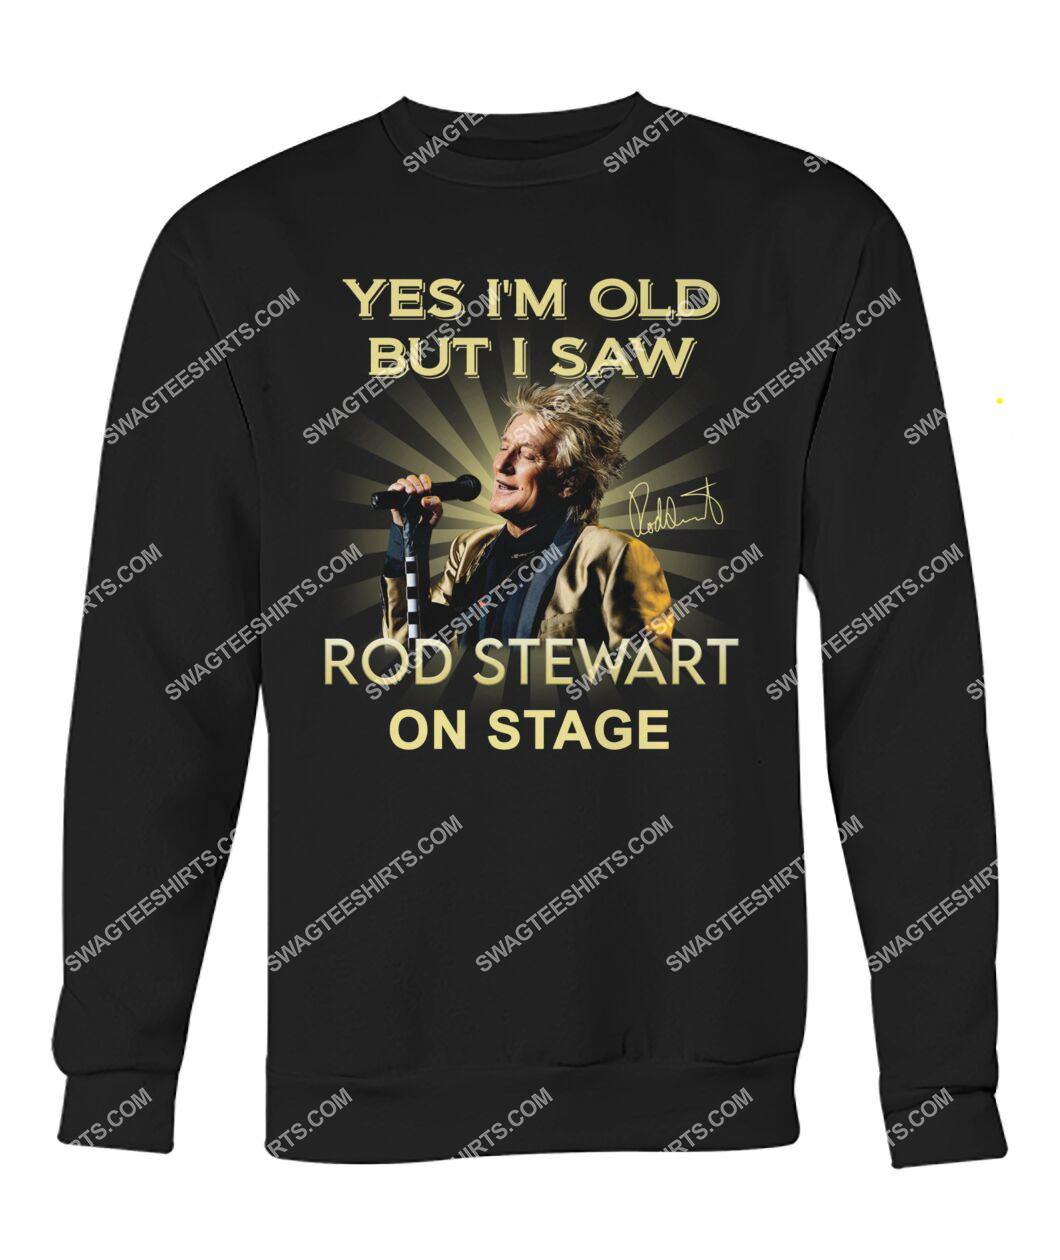 yes i am old but i saw rob stewart on stage vintage sweatshirt 1